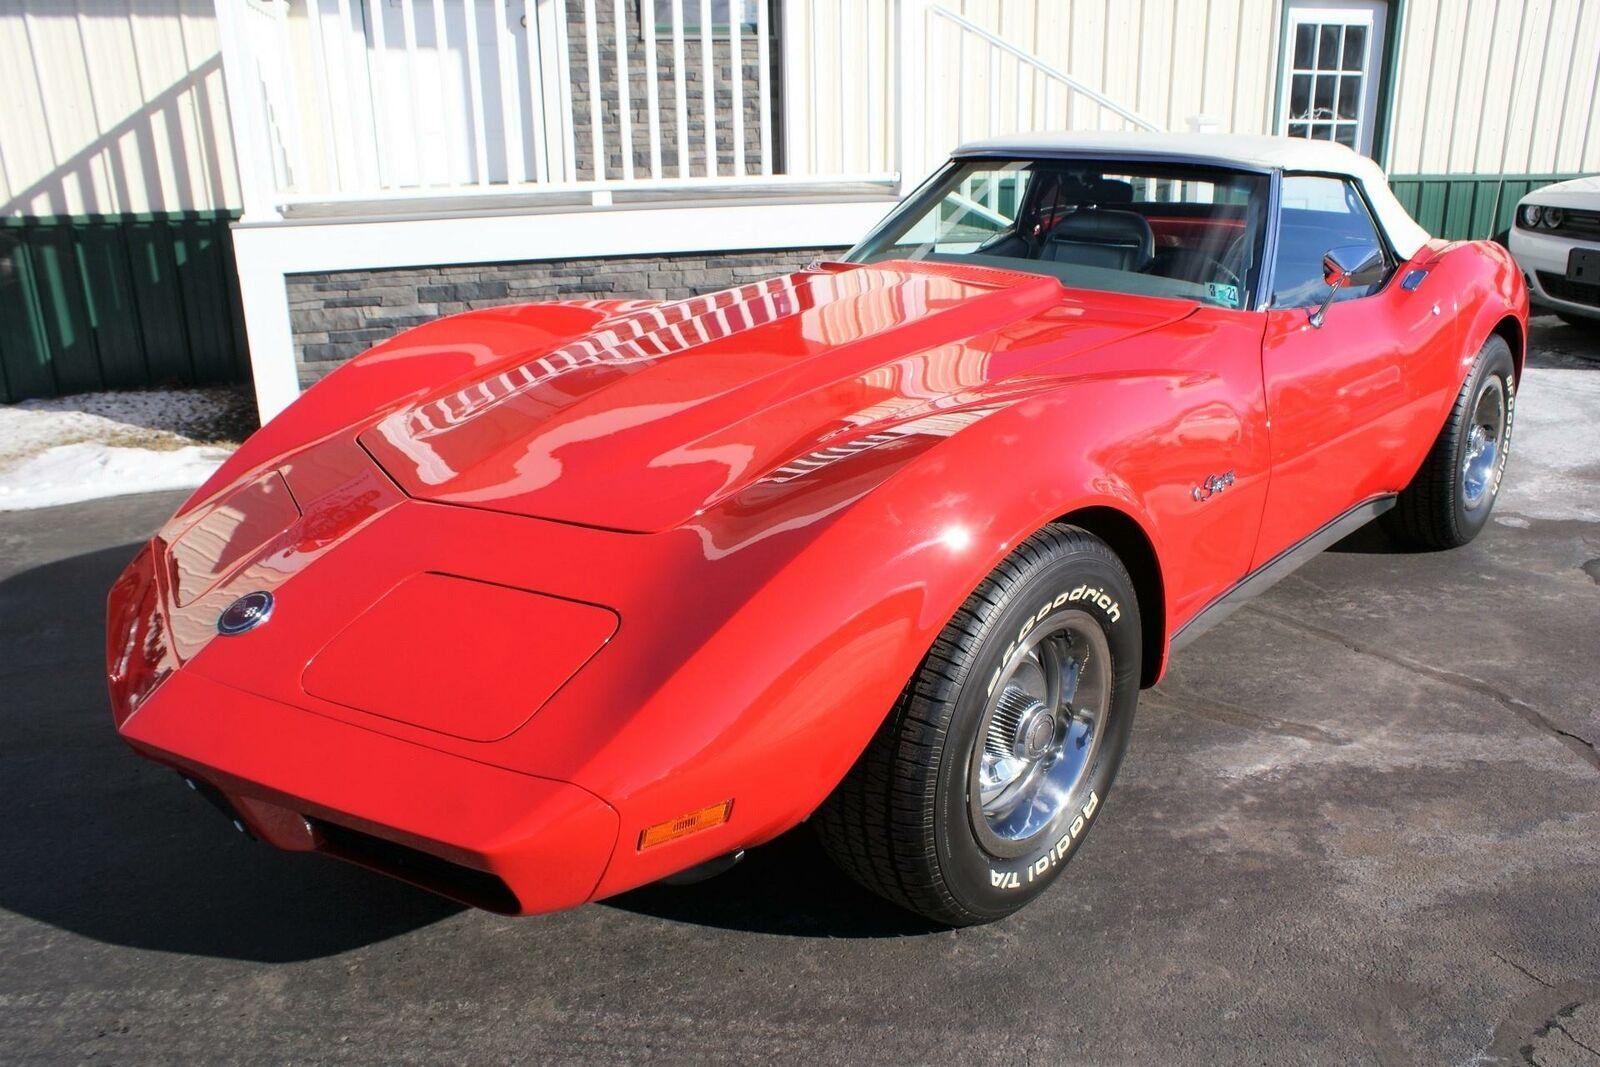 1974 Red Chevrolet Corvette  L82   C3 Corvette Photo 2